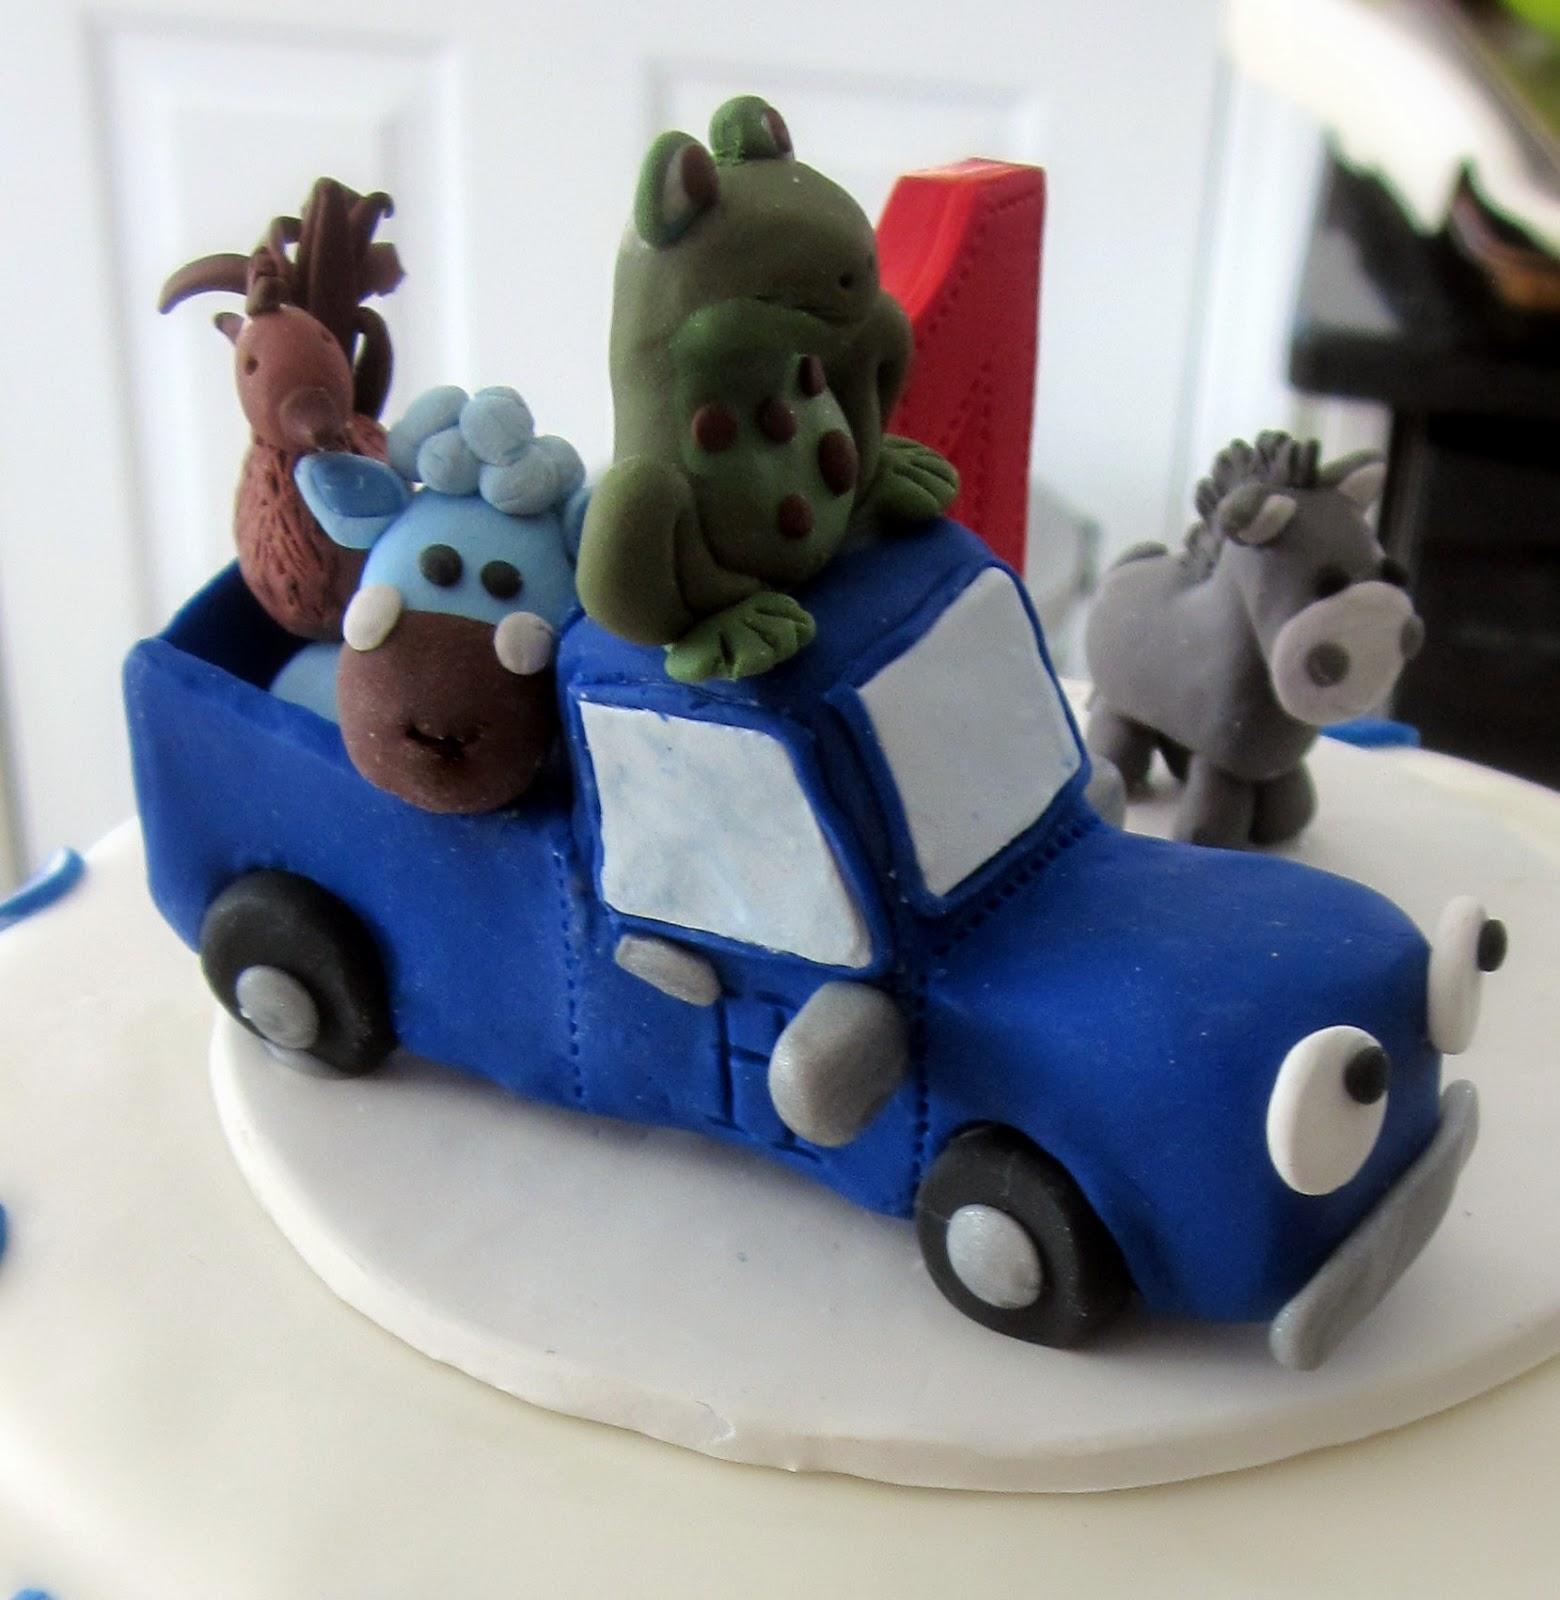 Darlin Designs The Little Blue Truck